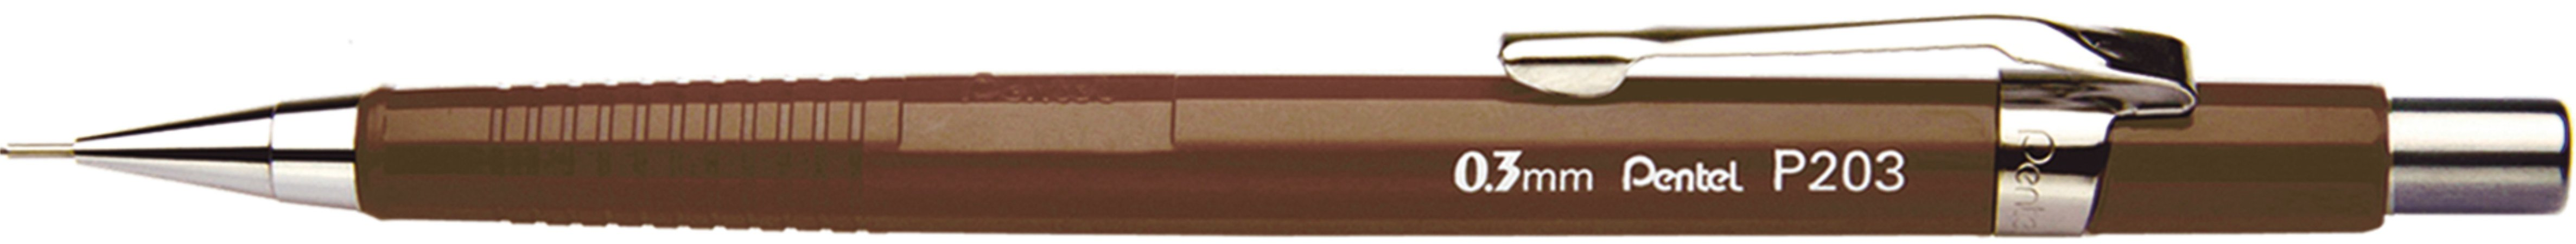 Lapiseira Pentel 0.3 Sharp P203 Marrom